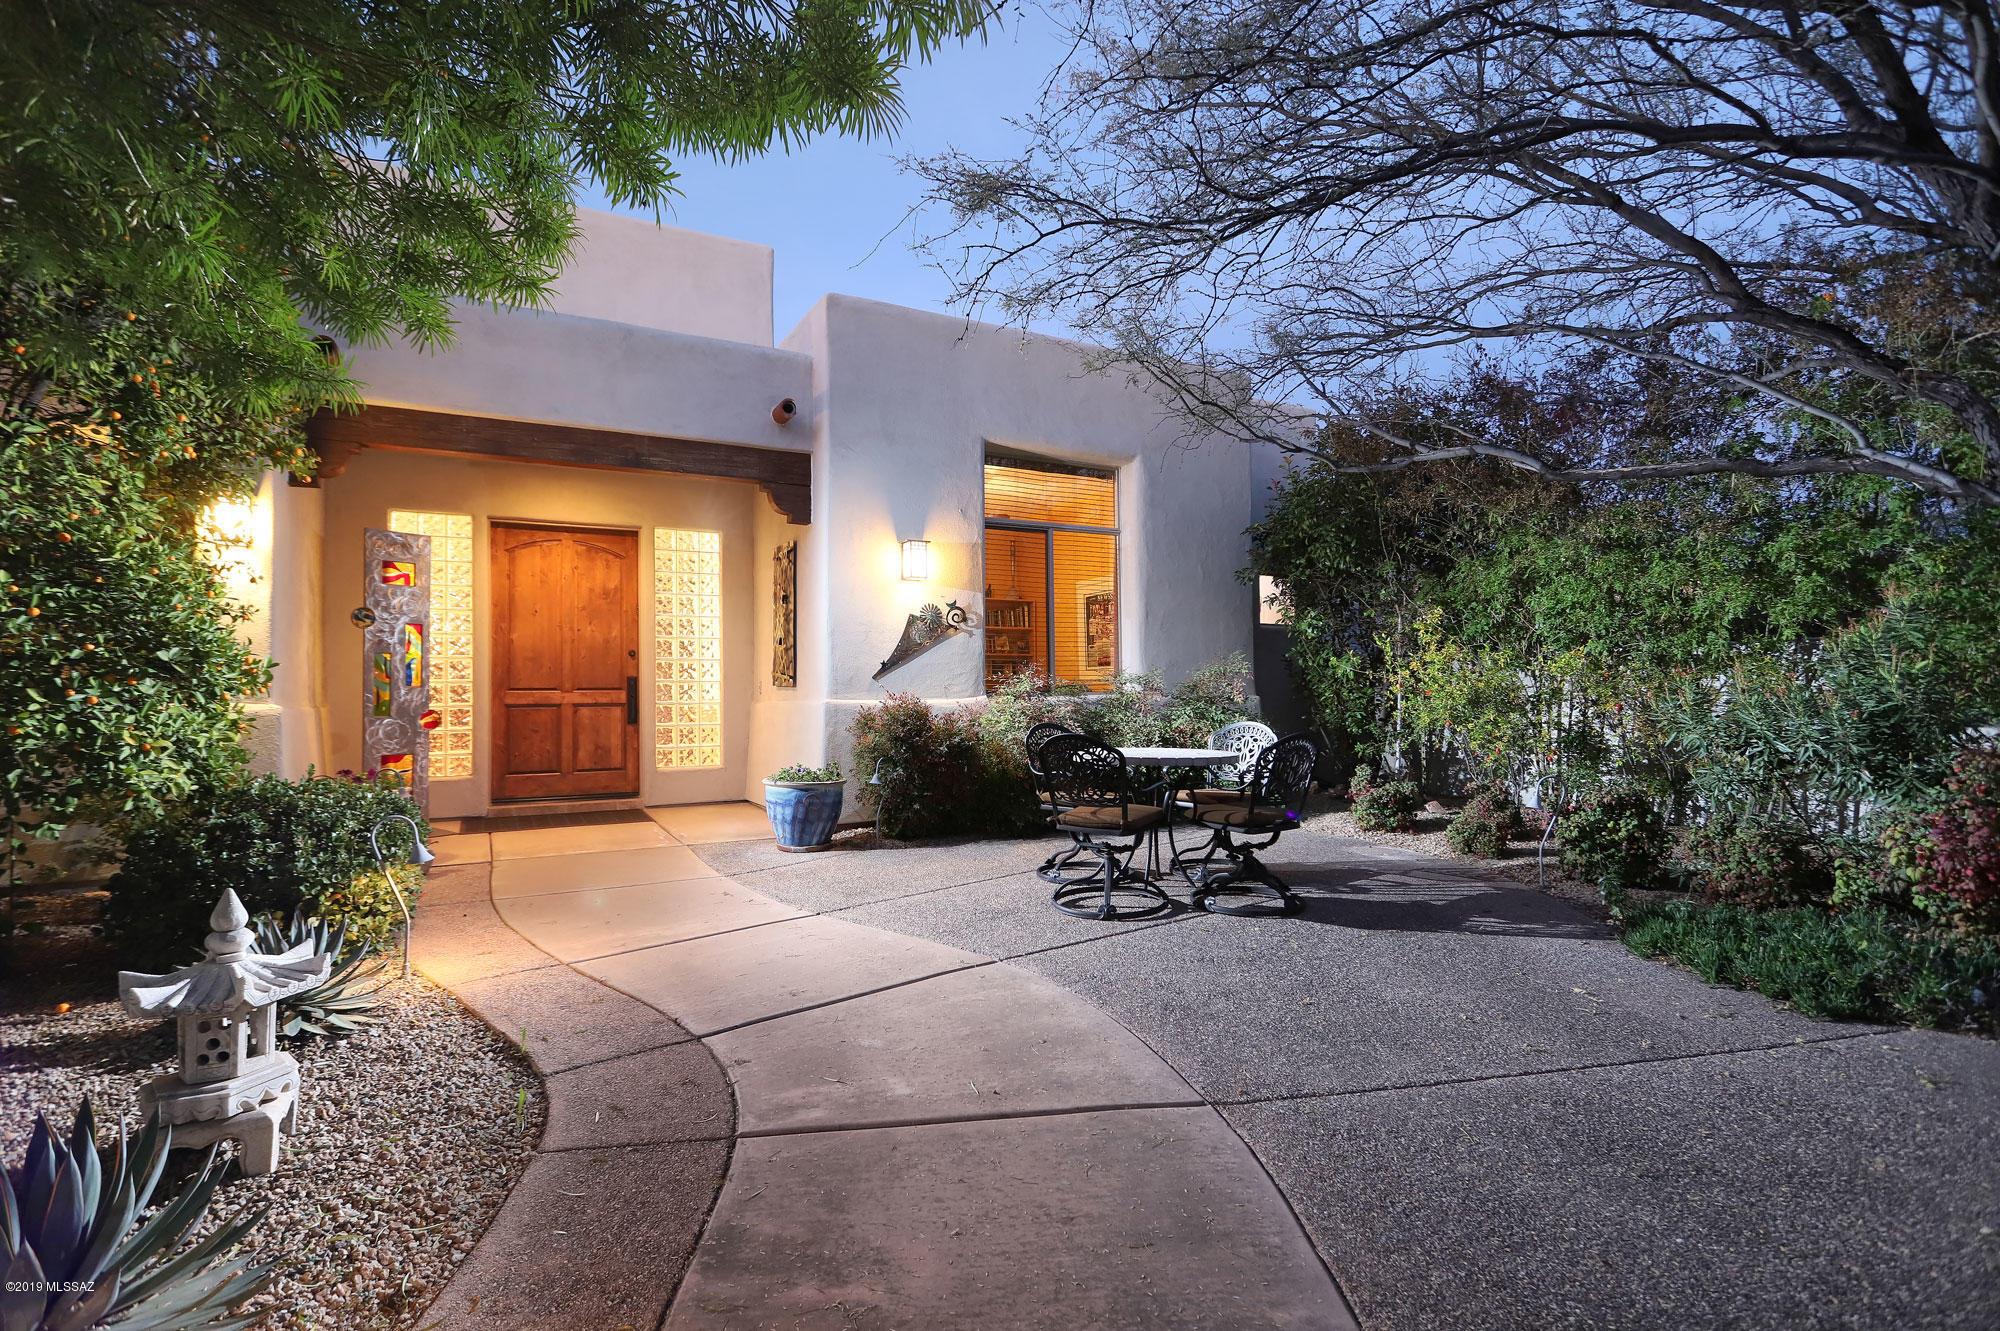 Photo of 6988 N Chula Vista Reserve Place, Tucson, AZ 85704